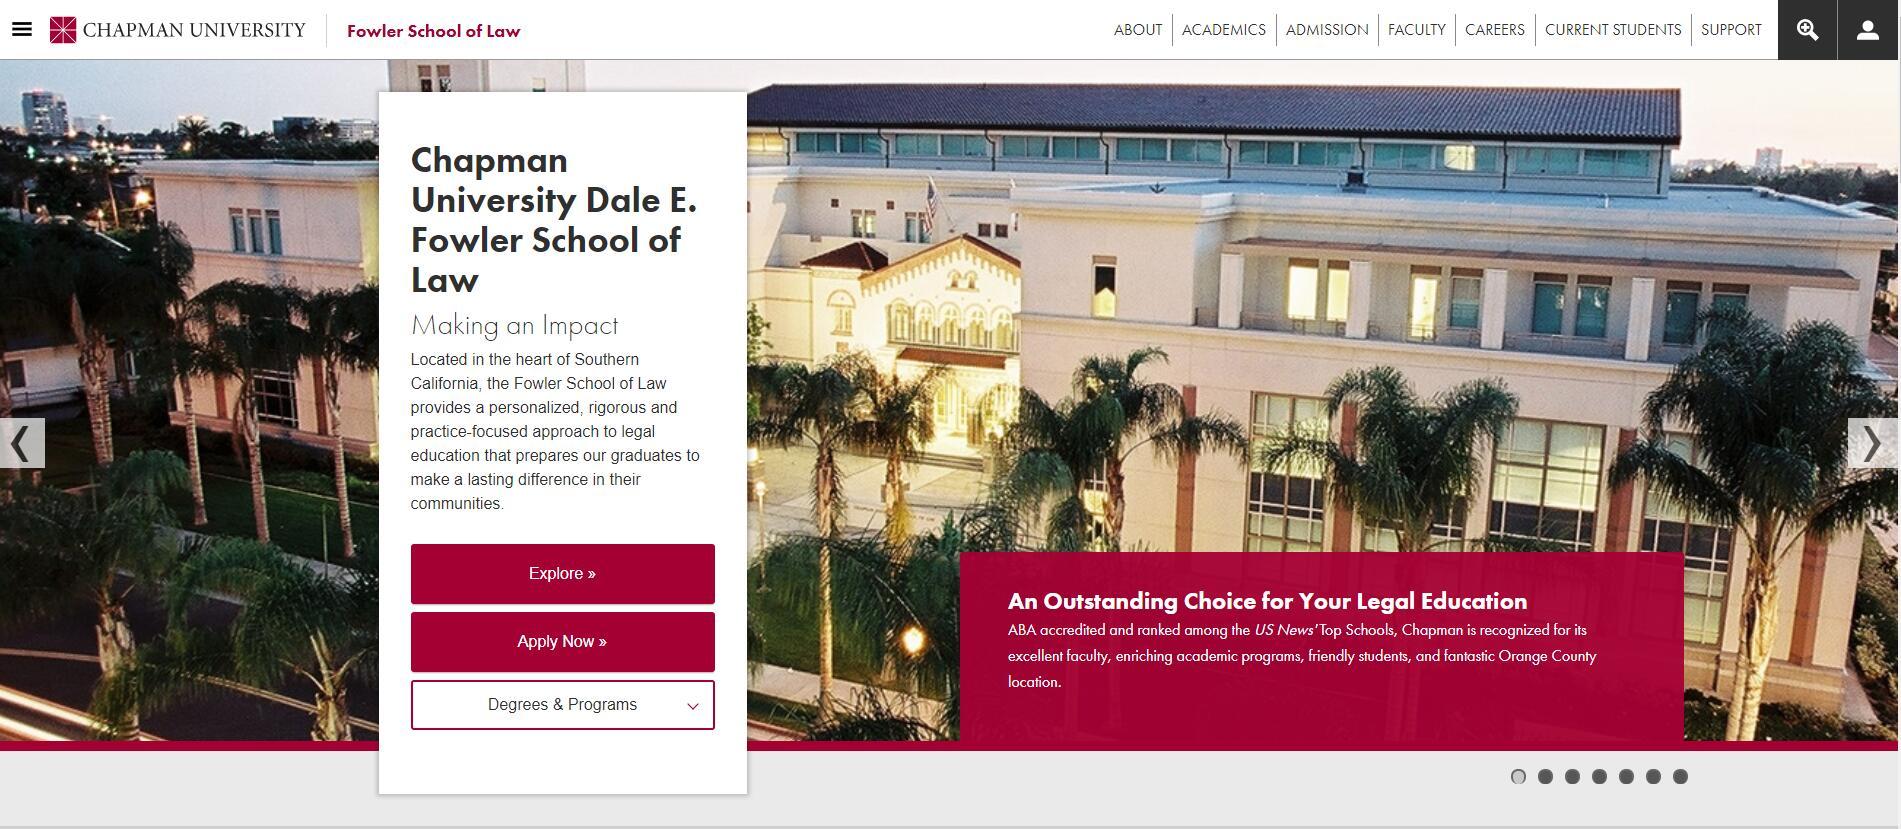 The School of Law at Chapman University